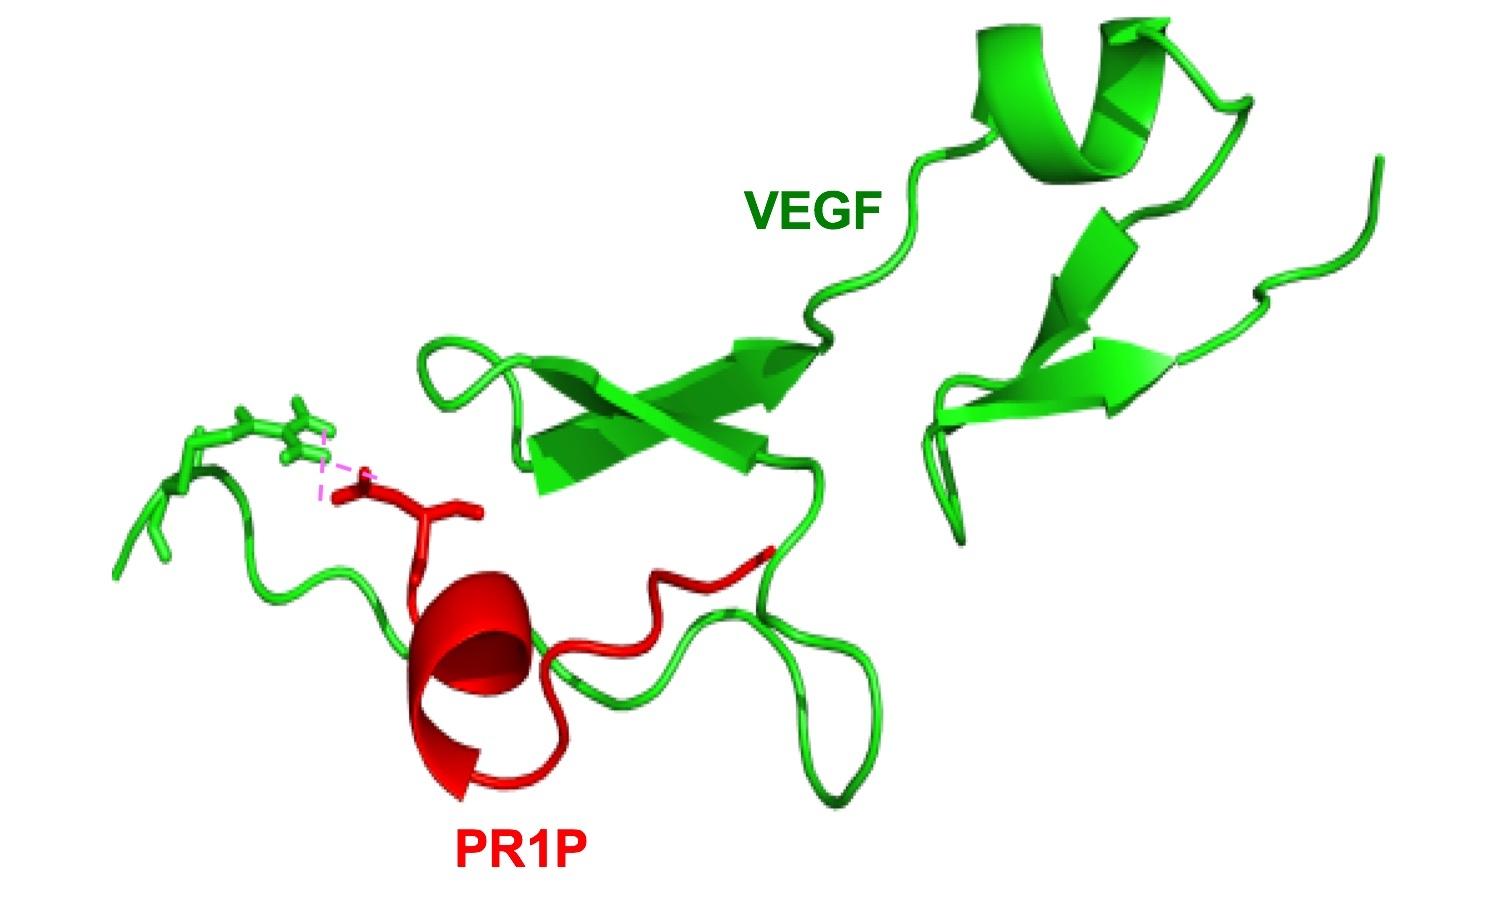 PR1P binding to VEGF